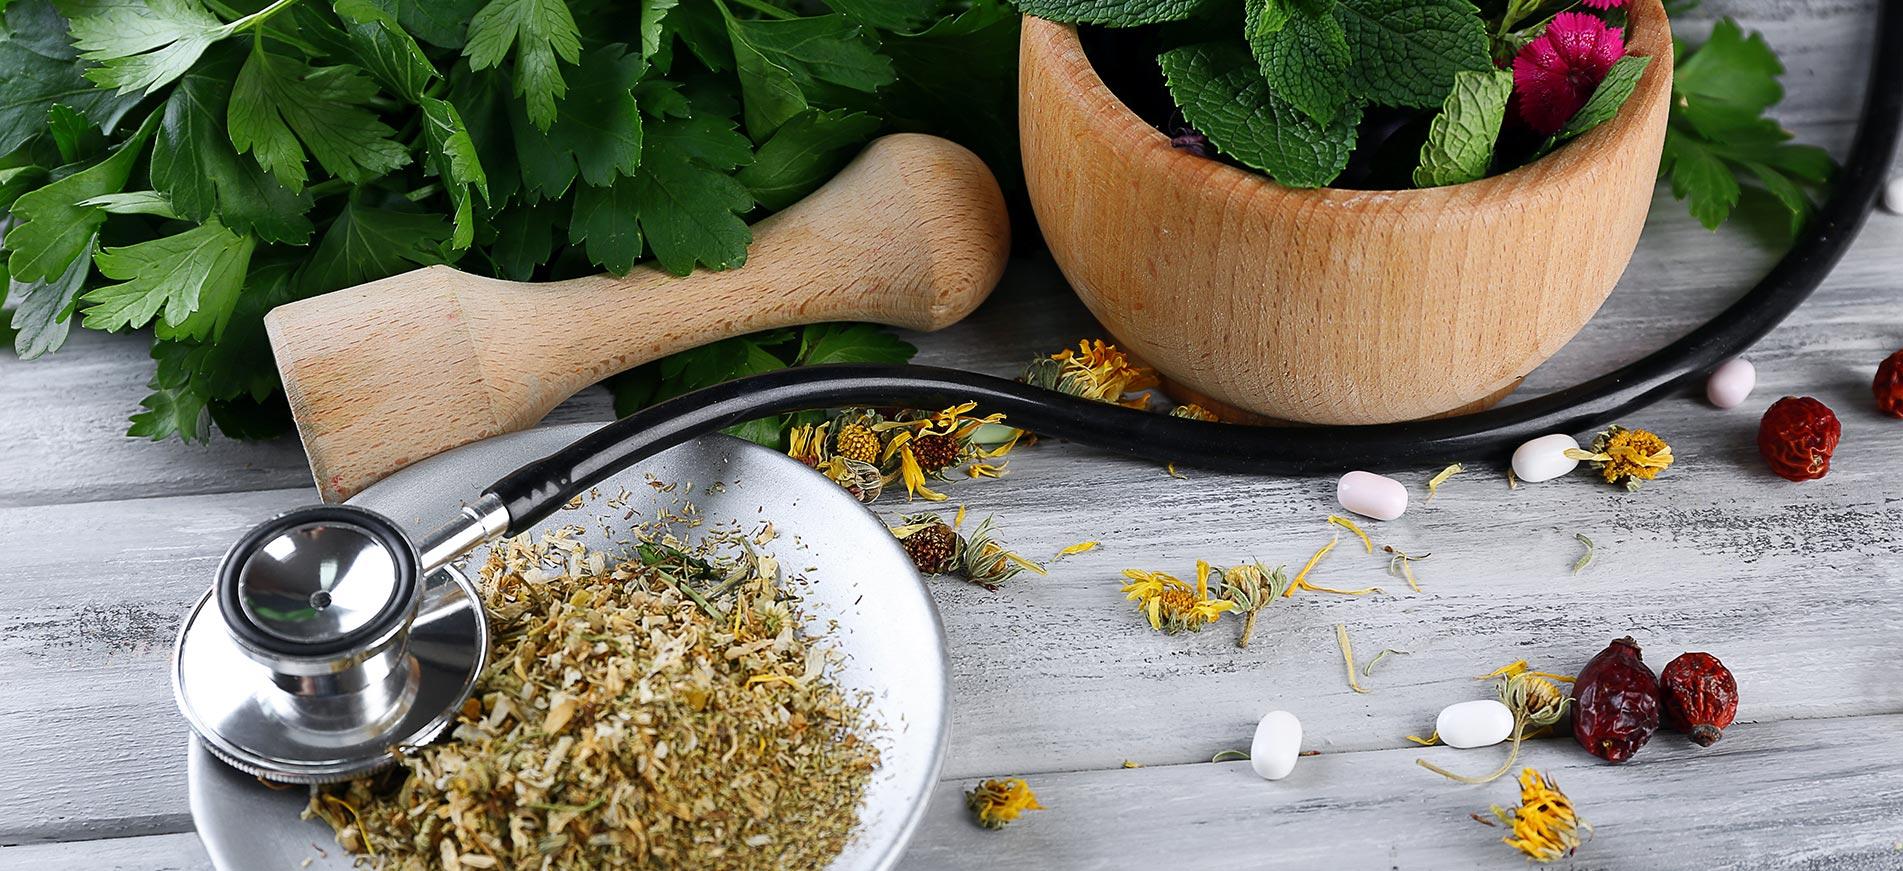 Terapias naturales, Acupuntura y Medicina Tradicional China